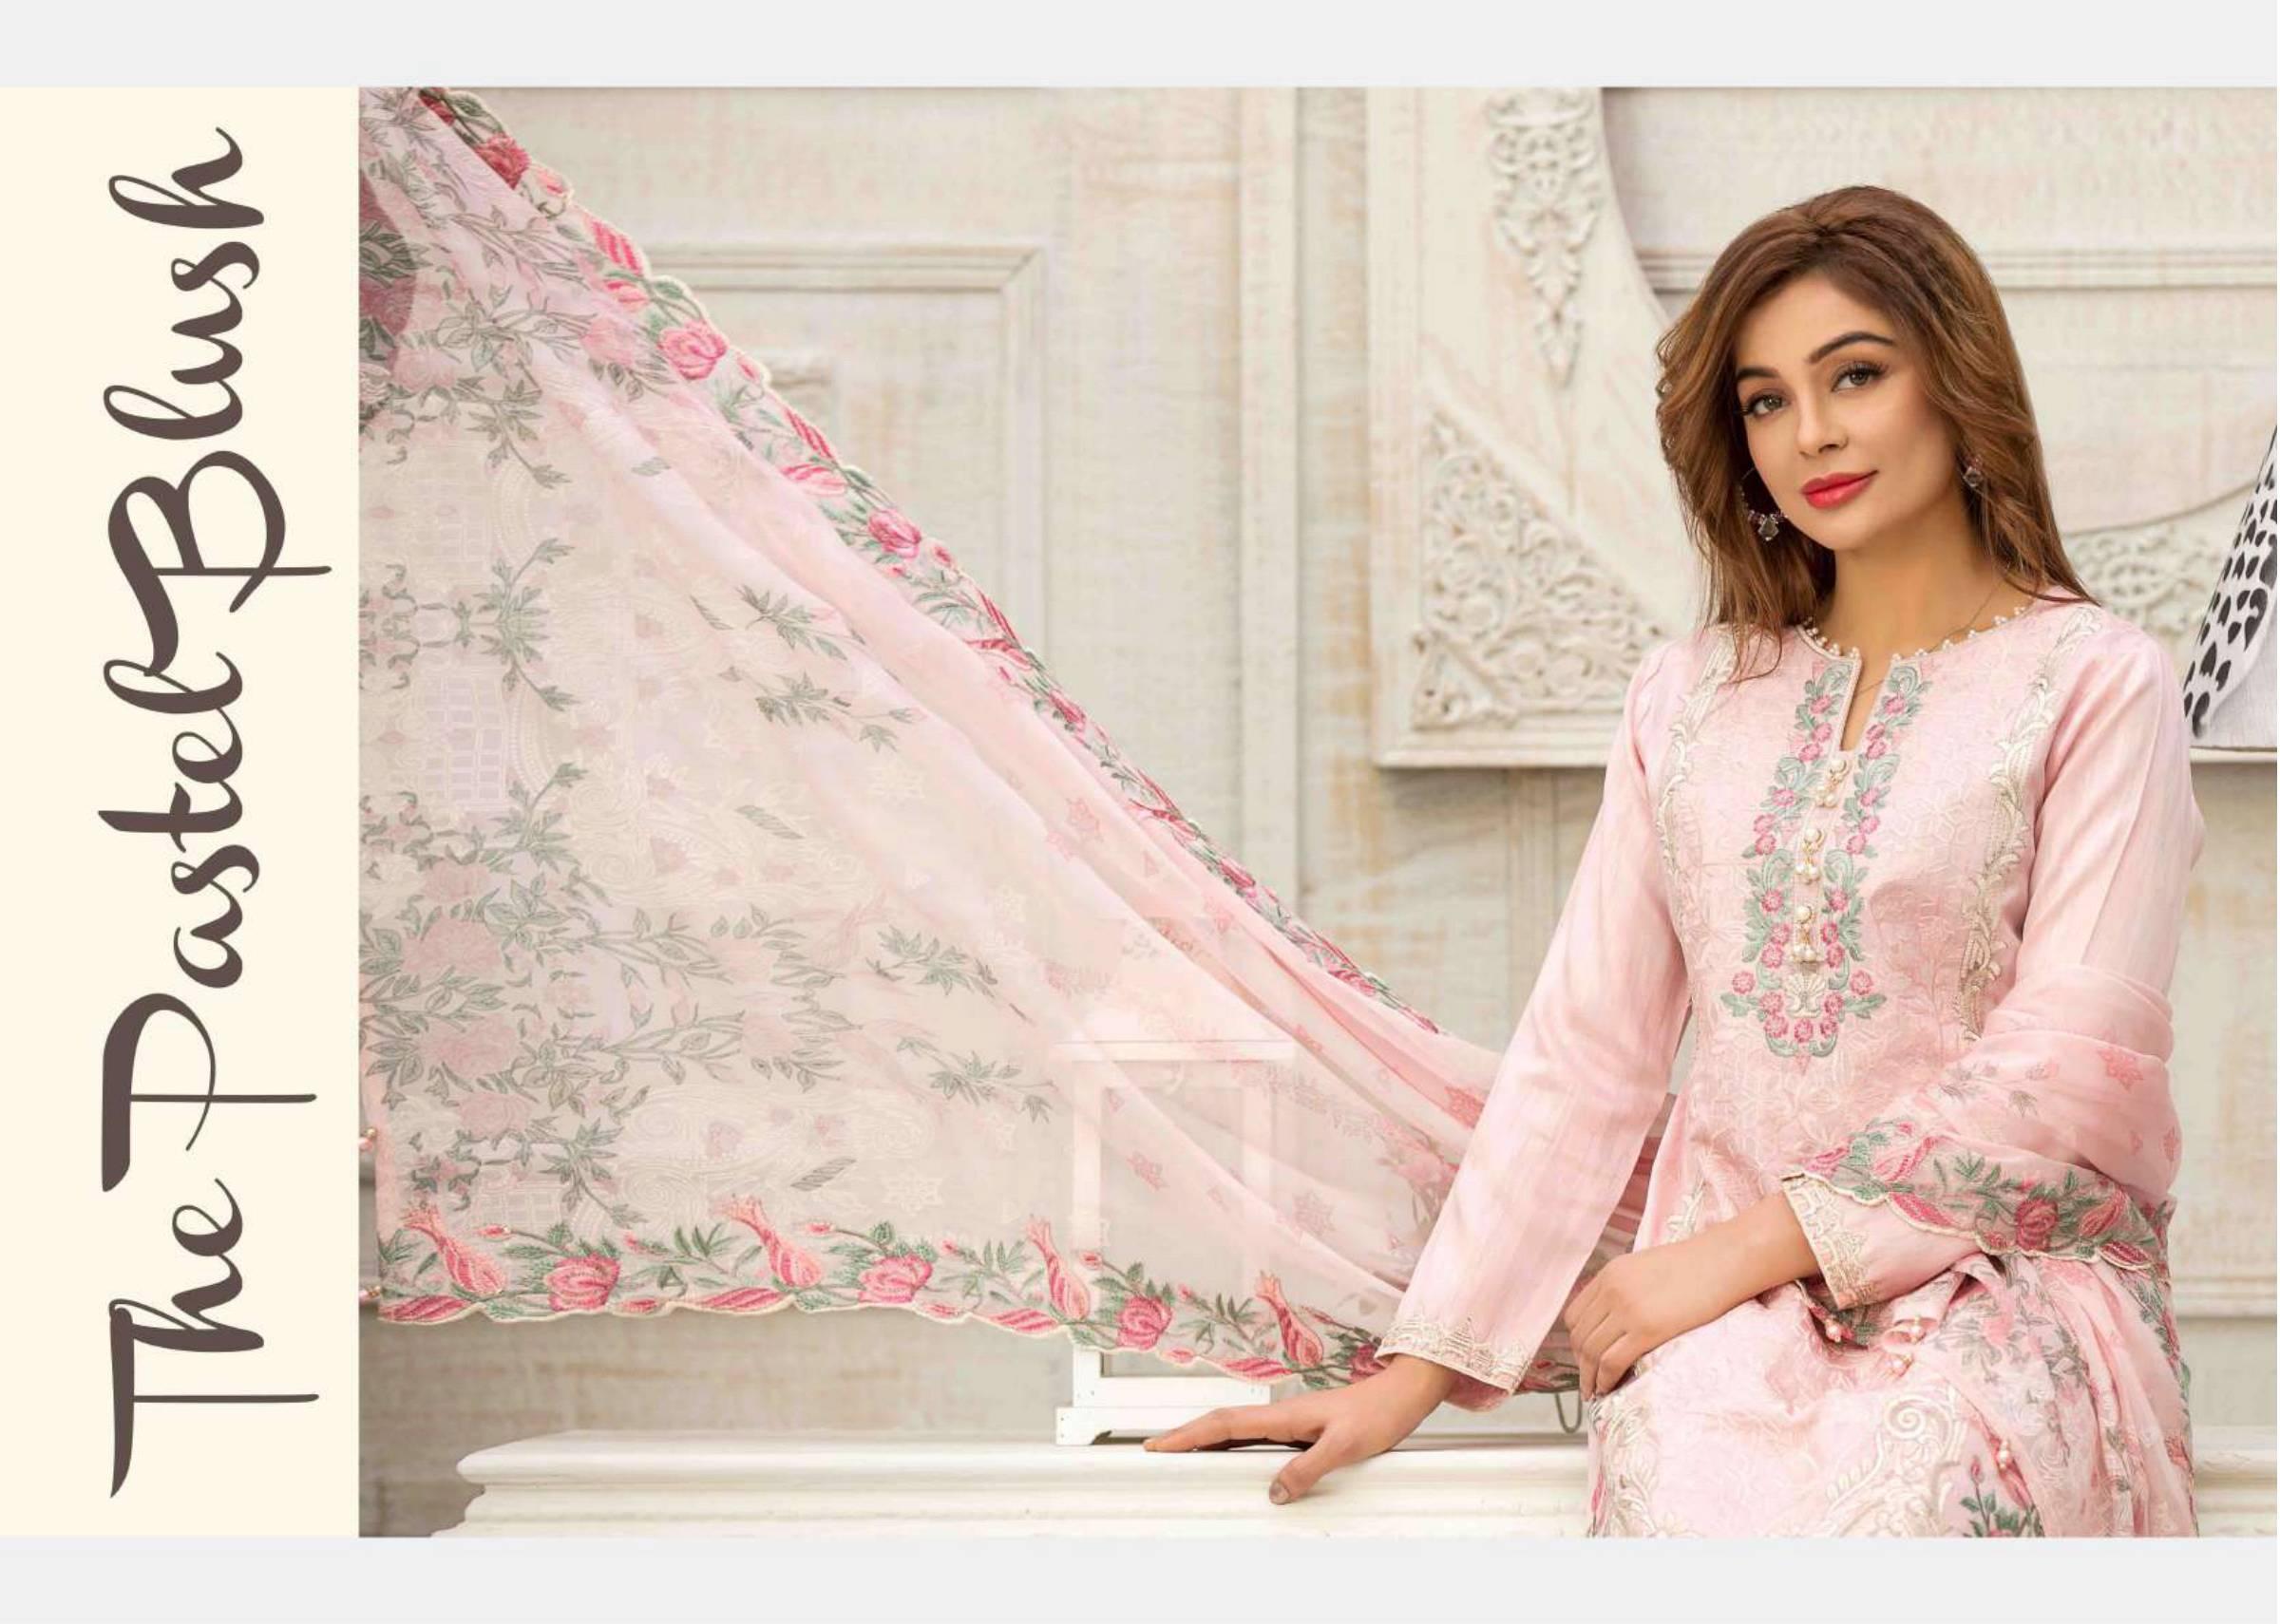 Tawakkal Sylvan Fancy Viscose Lawn Semistiched Original Pakistani Suits Wholesale Rate